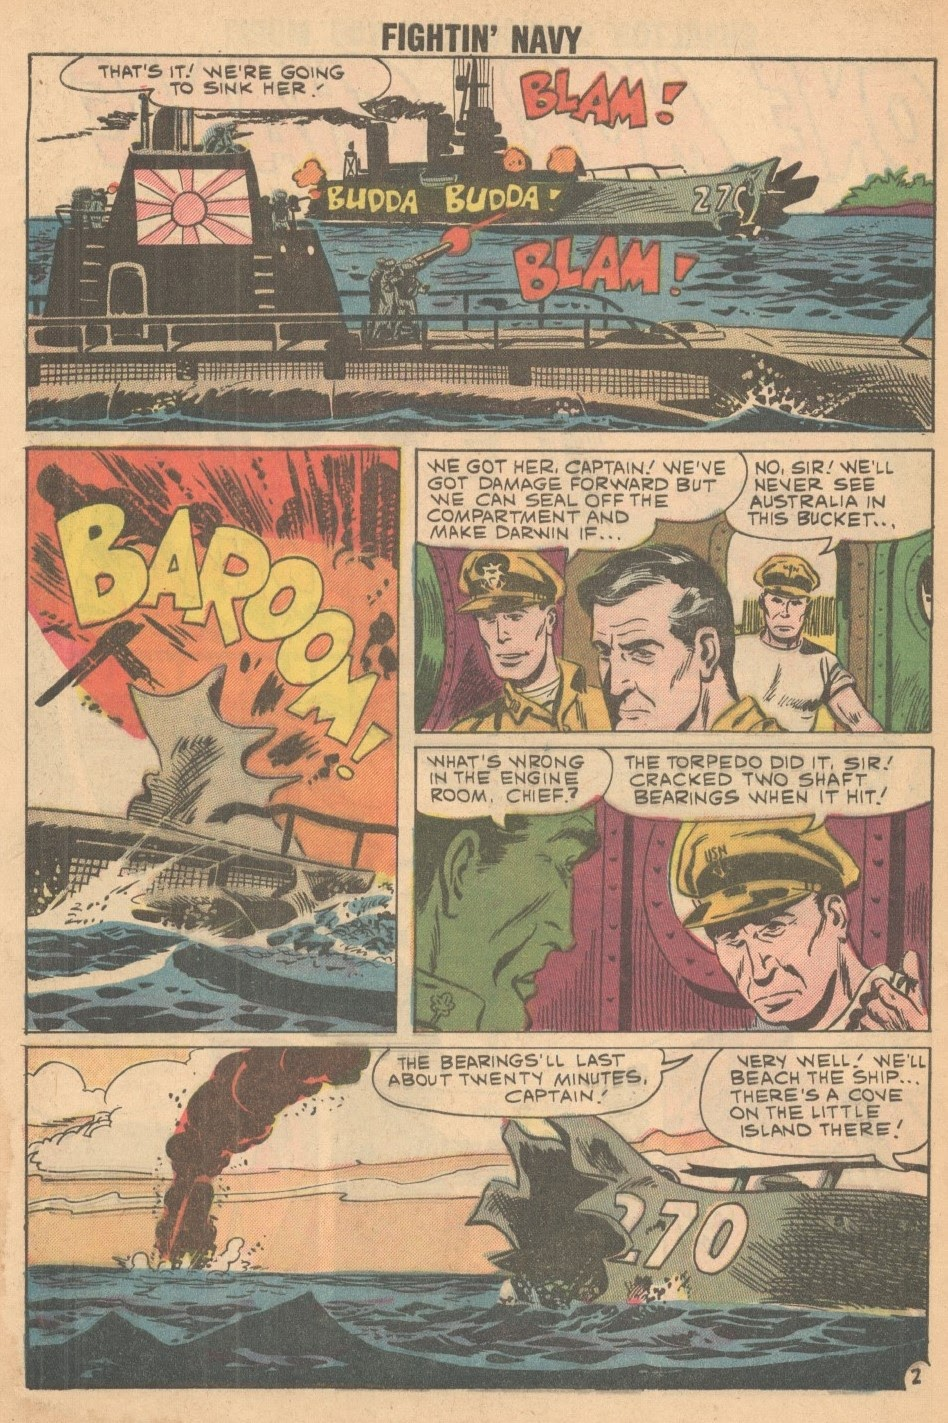 Read online Fightin' Navy comic -  Issue #93 - 4